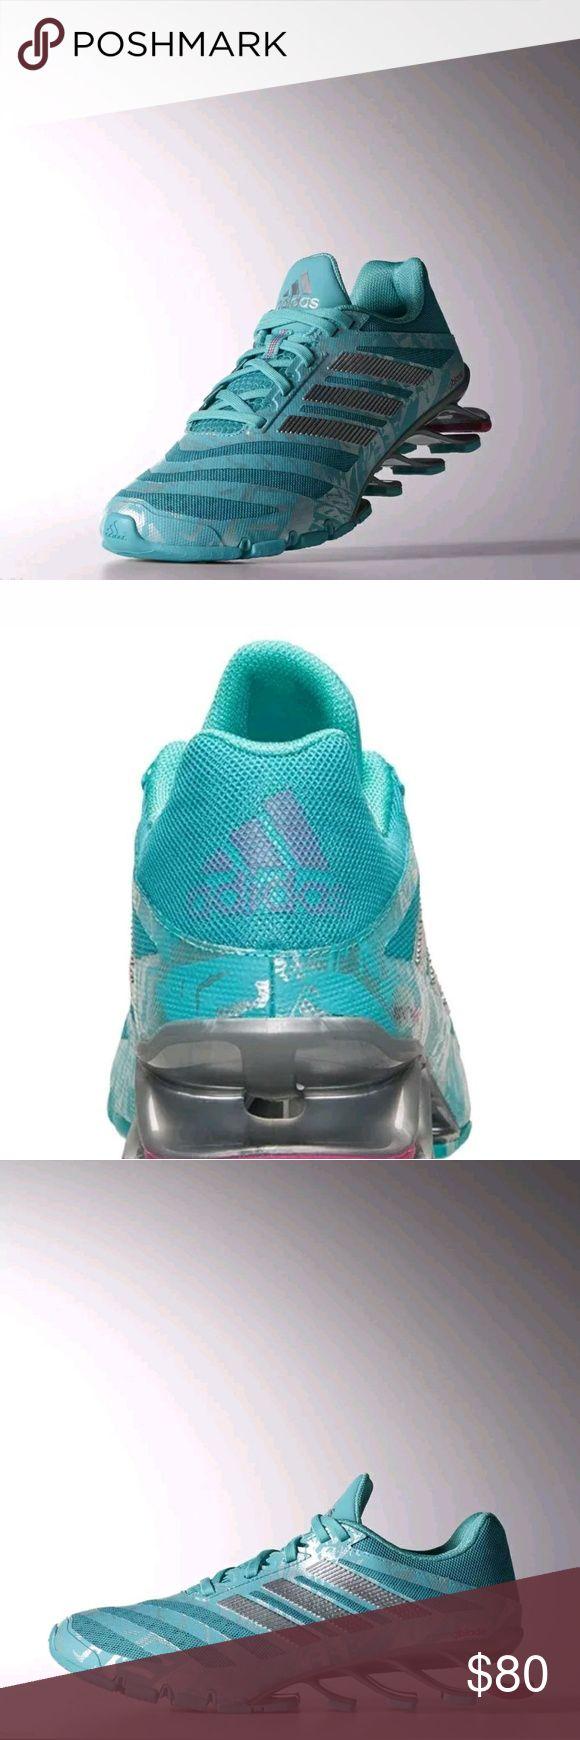 I just added this listing on Poshmark: Adidas Springblade Ignite Size 8 1/2